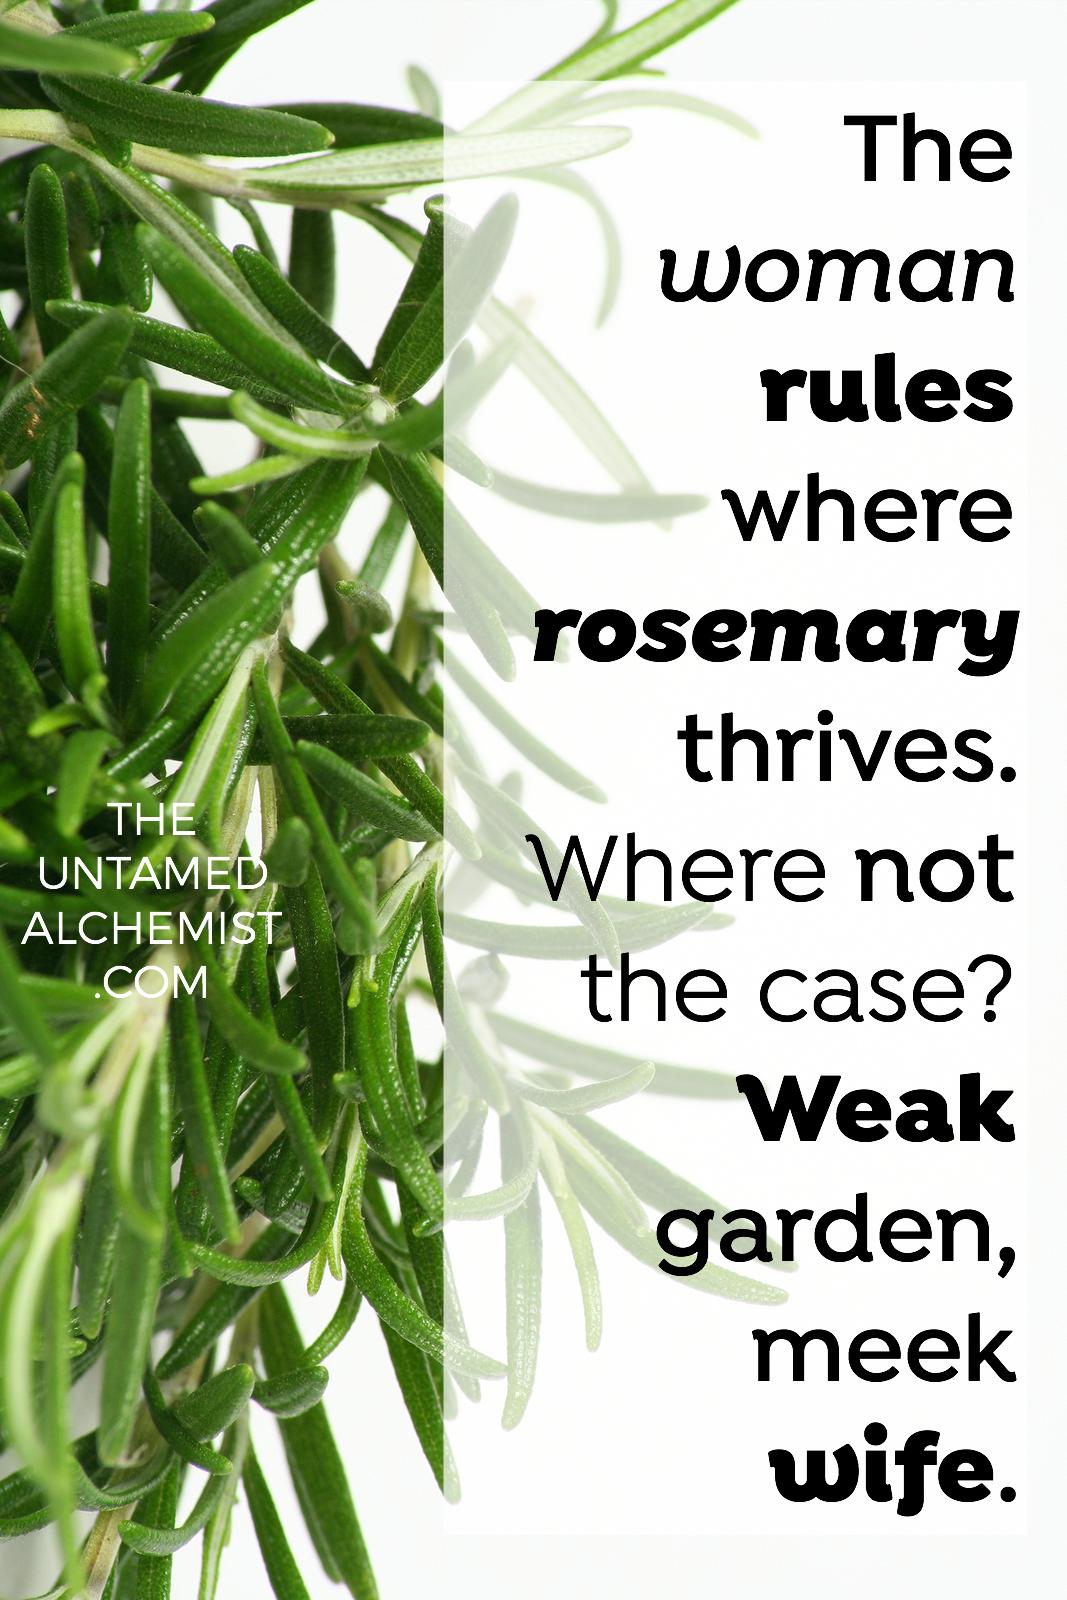 wisdom in brief rosemary.jpg